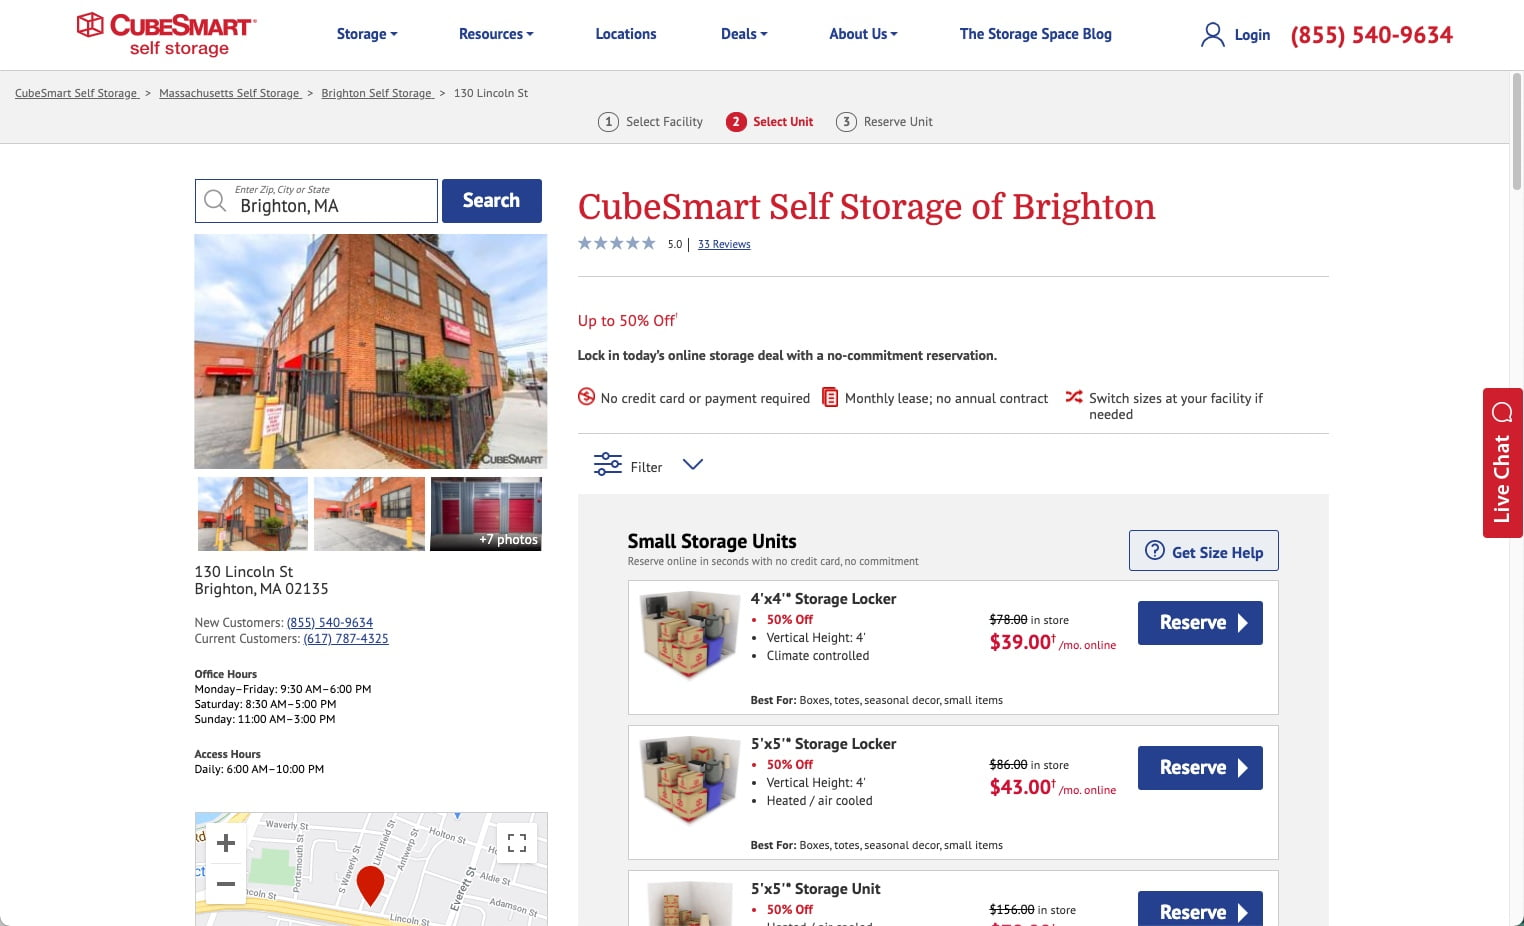 CubeSmart Self Storage of Brighton